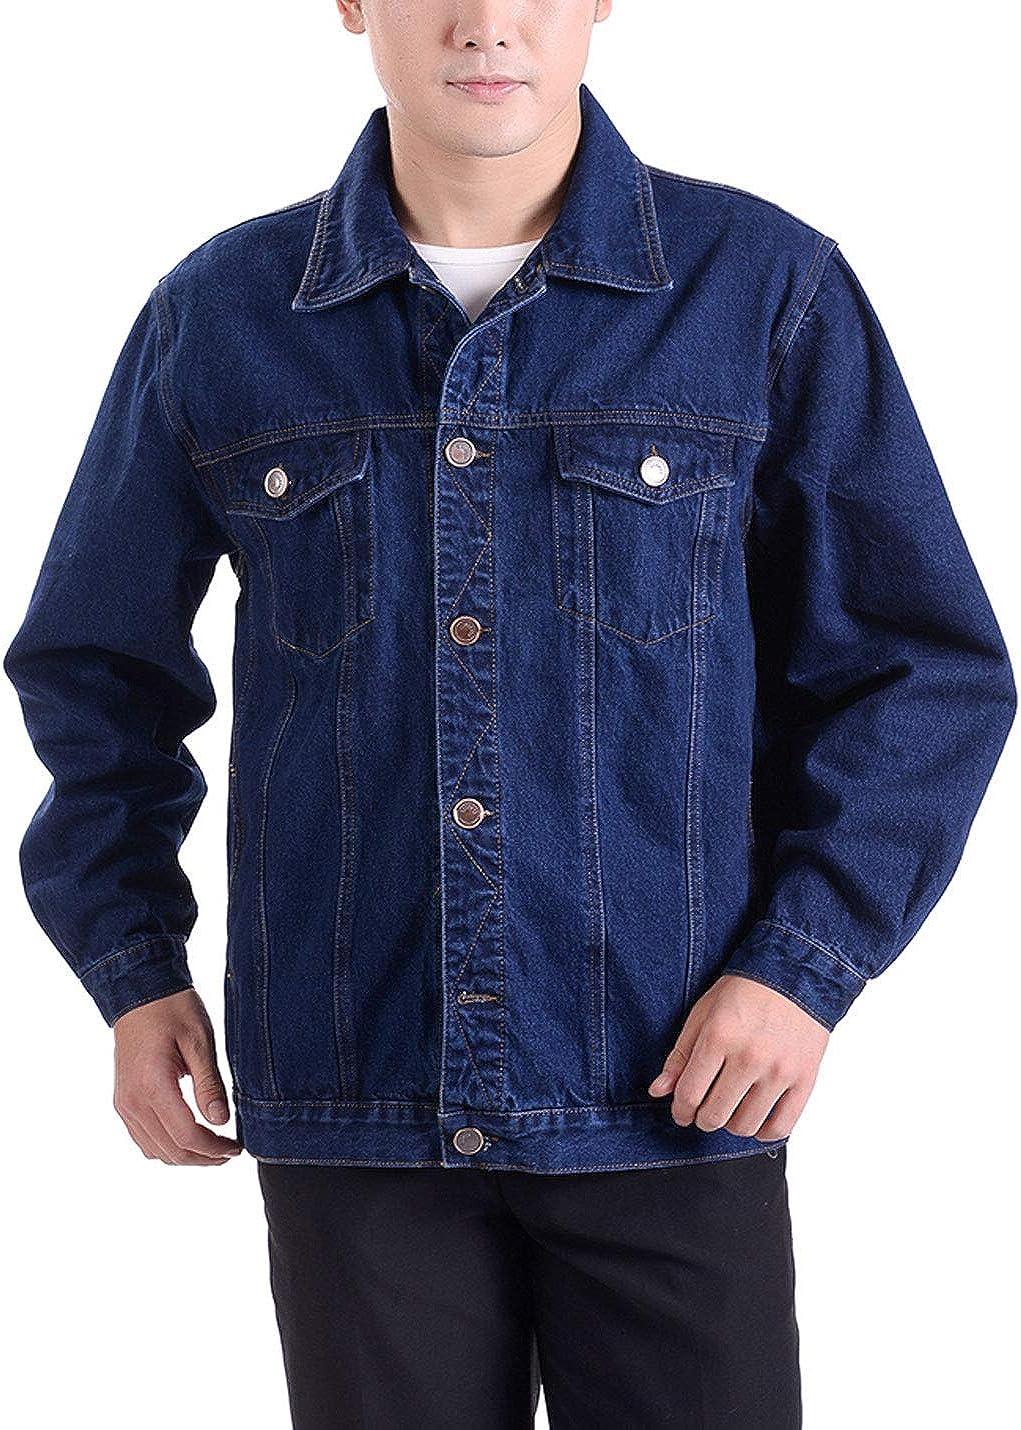 Omoone Men's Loose Lapel Collar Casual Denim Jean Workwear Jacket Coats